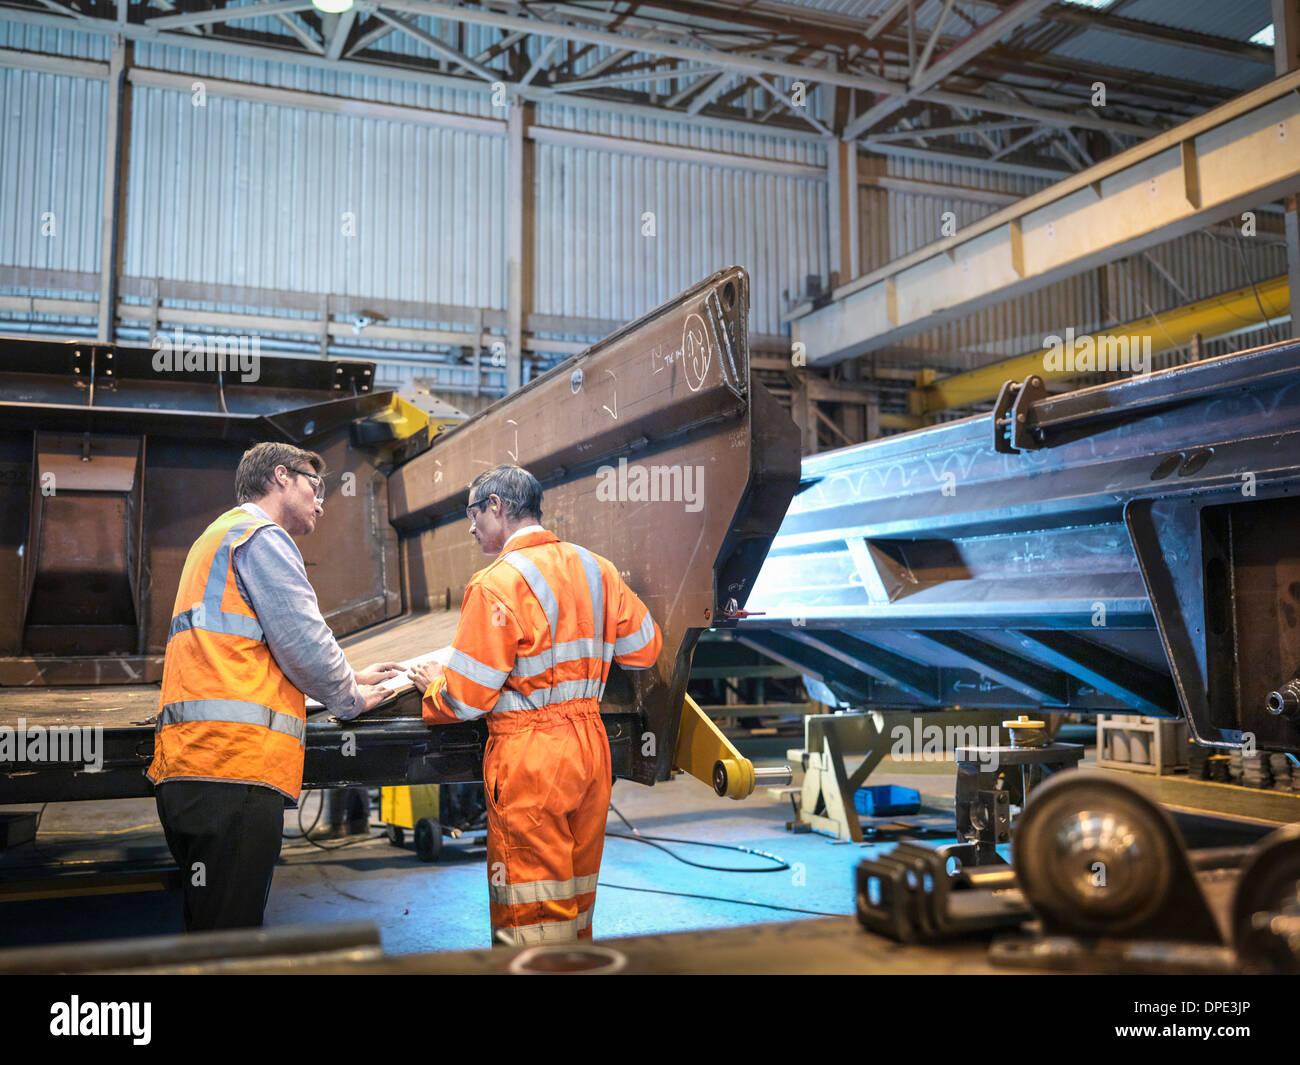 Engineers discussing engineering drawings in factory - Stock Image